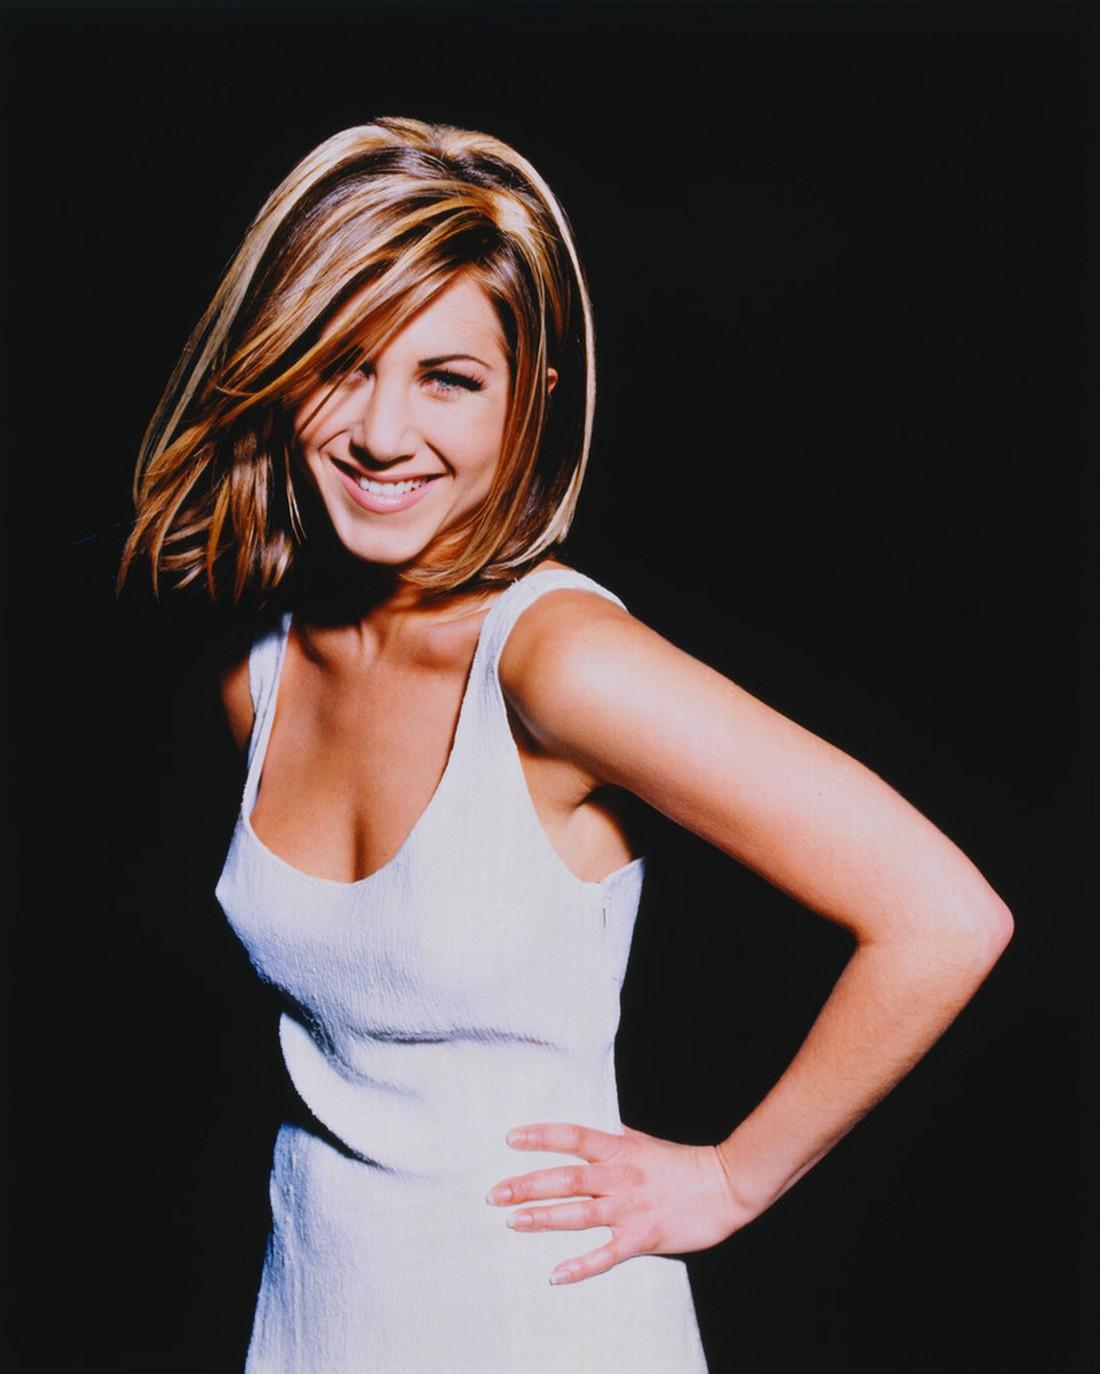 Jennifer aniston foto robada